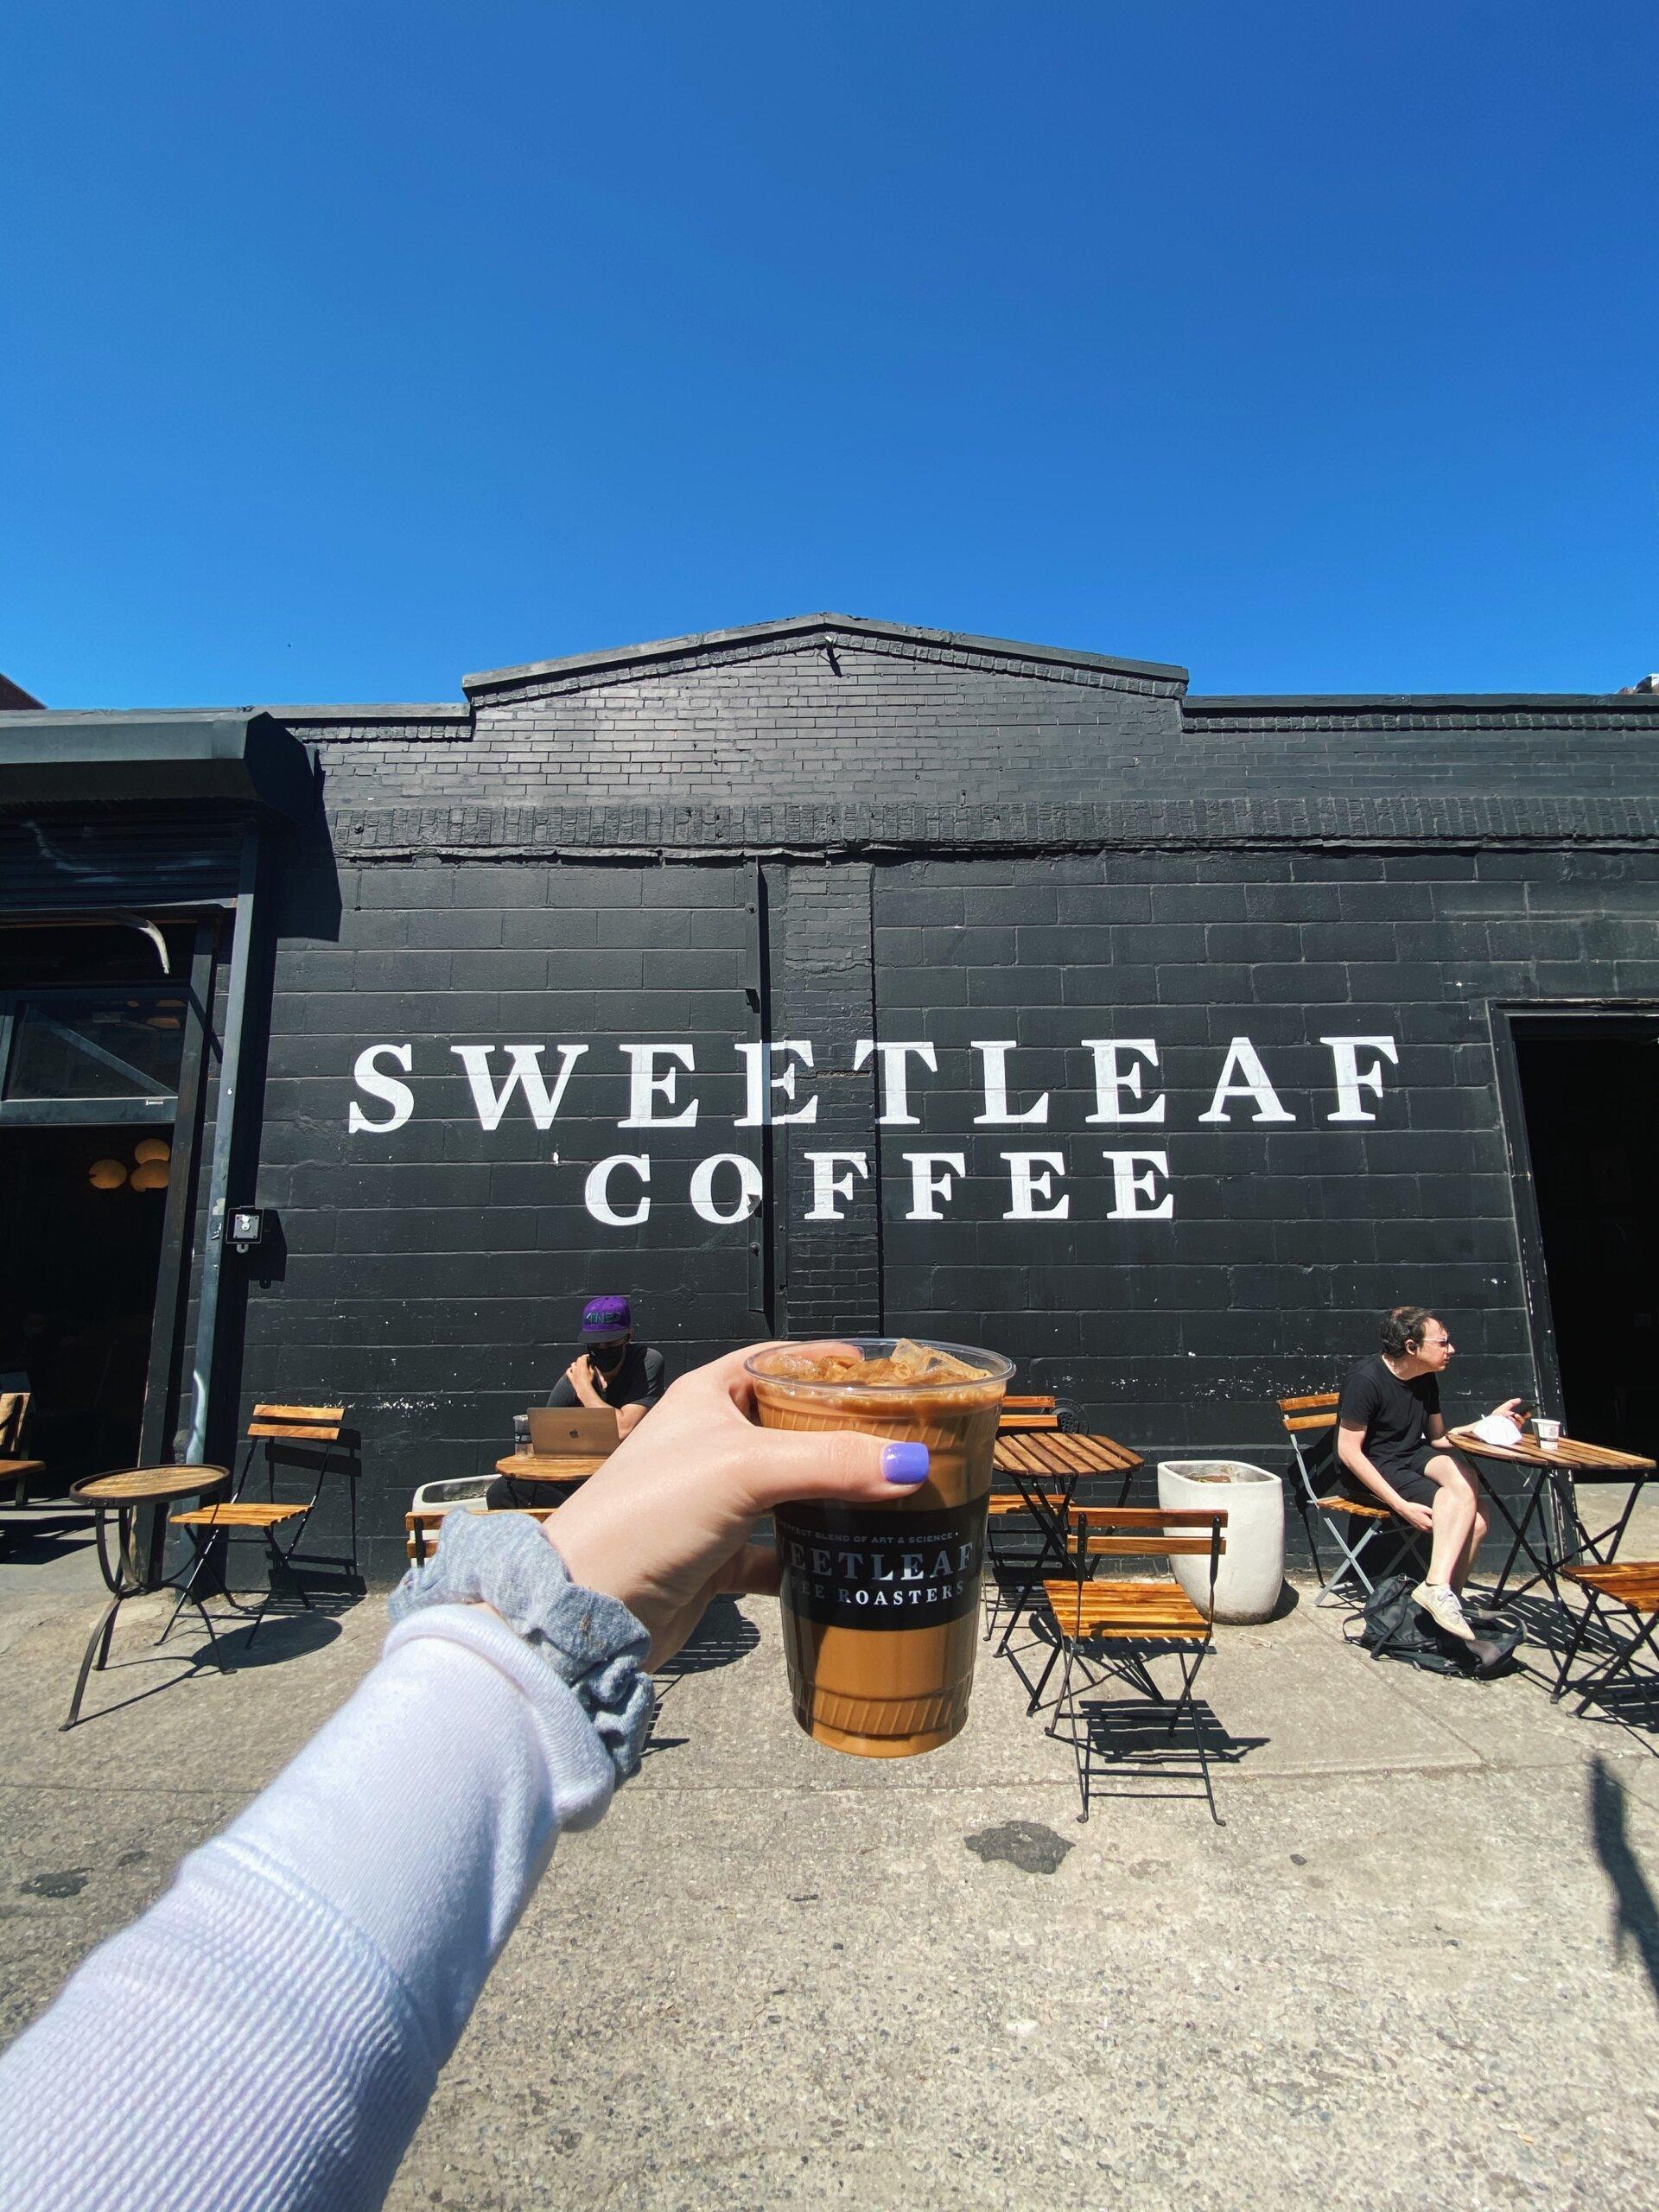 Sweetleaf Coffee Roasters in Greenpoint Brooklyn by Quoffee Quest